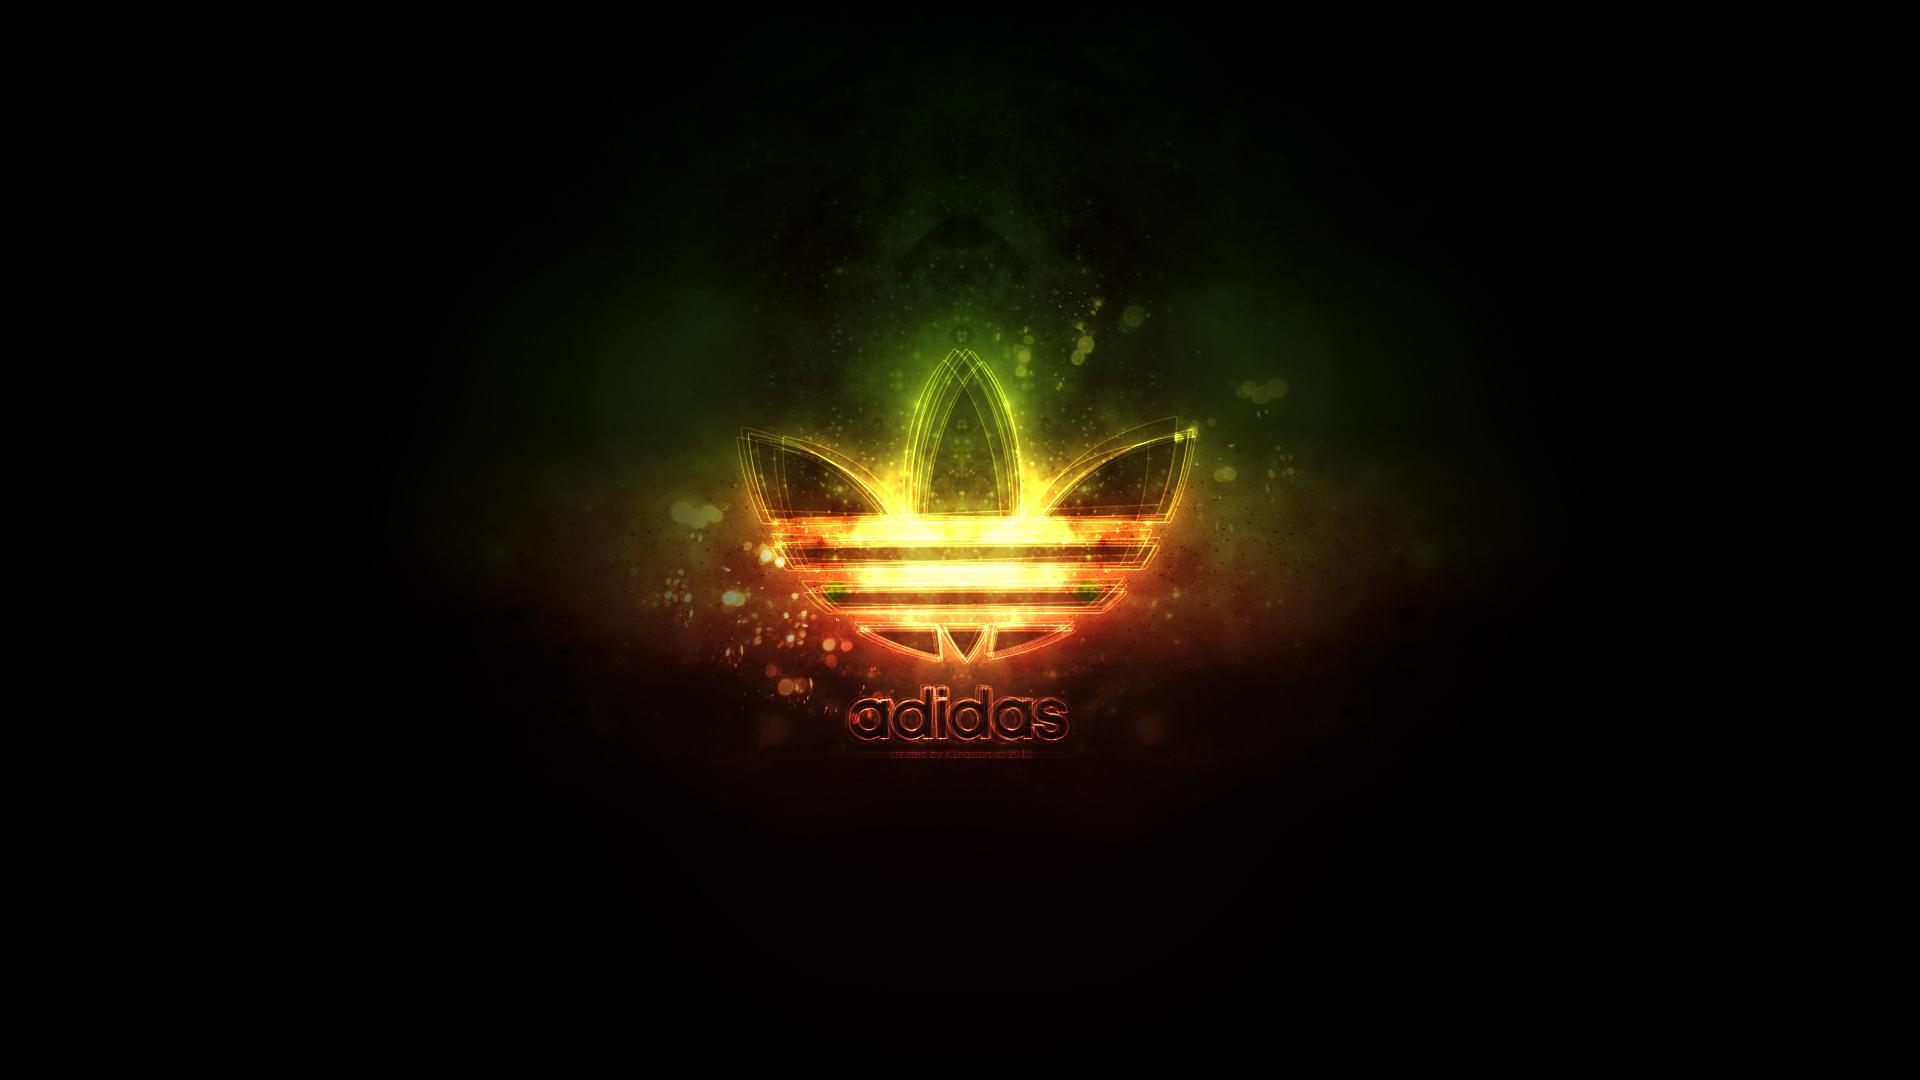 Adidas Logo Wallpaper HD by k1ngston 1920x1080